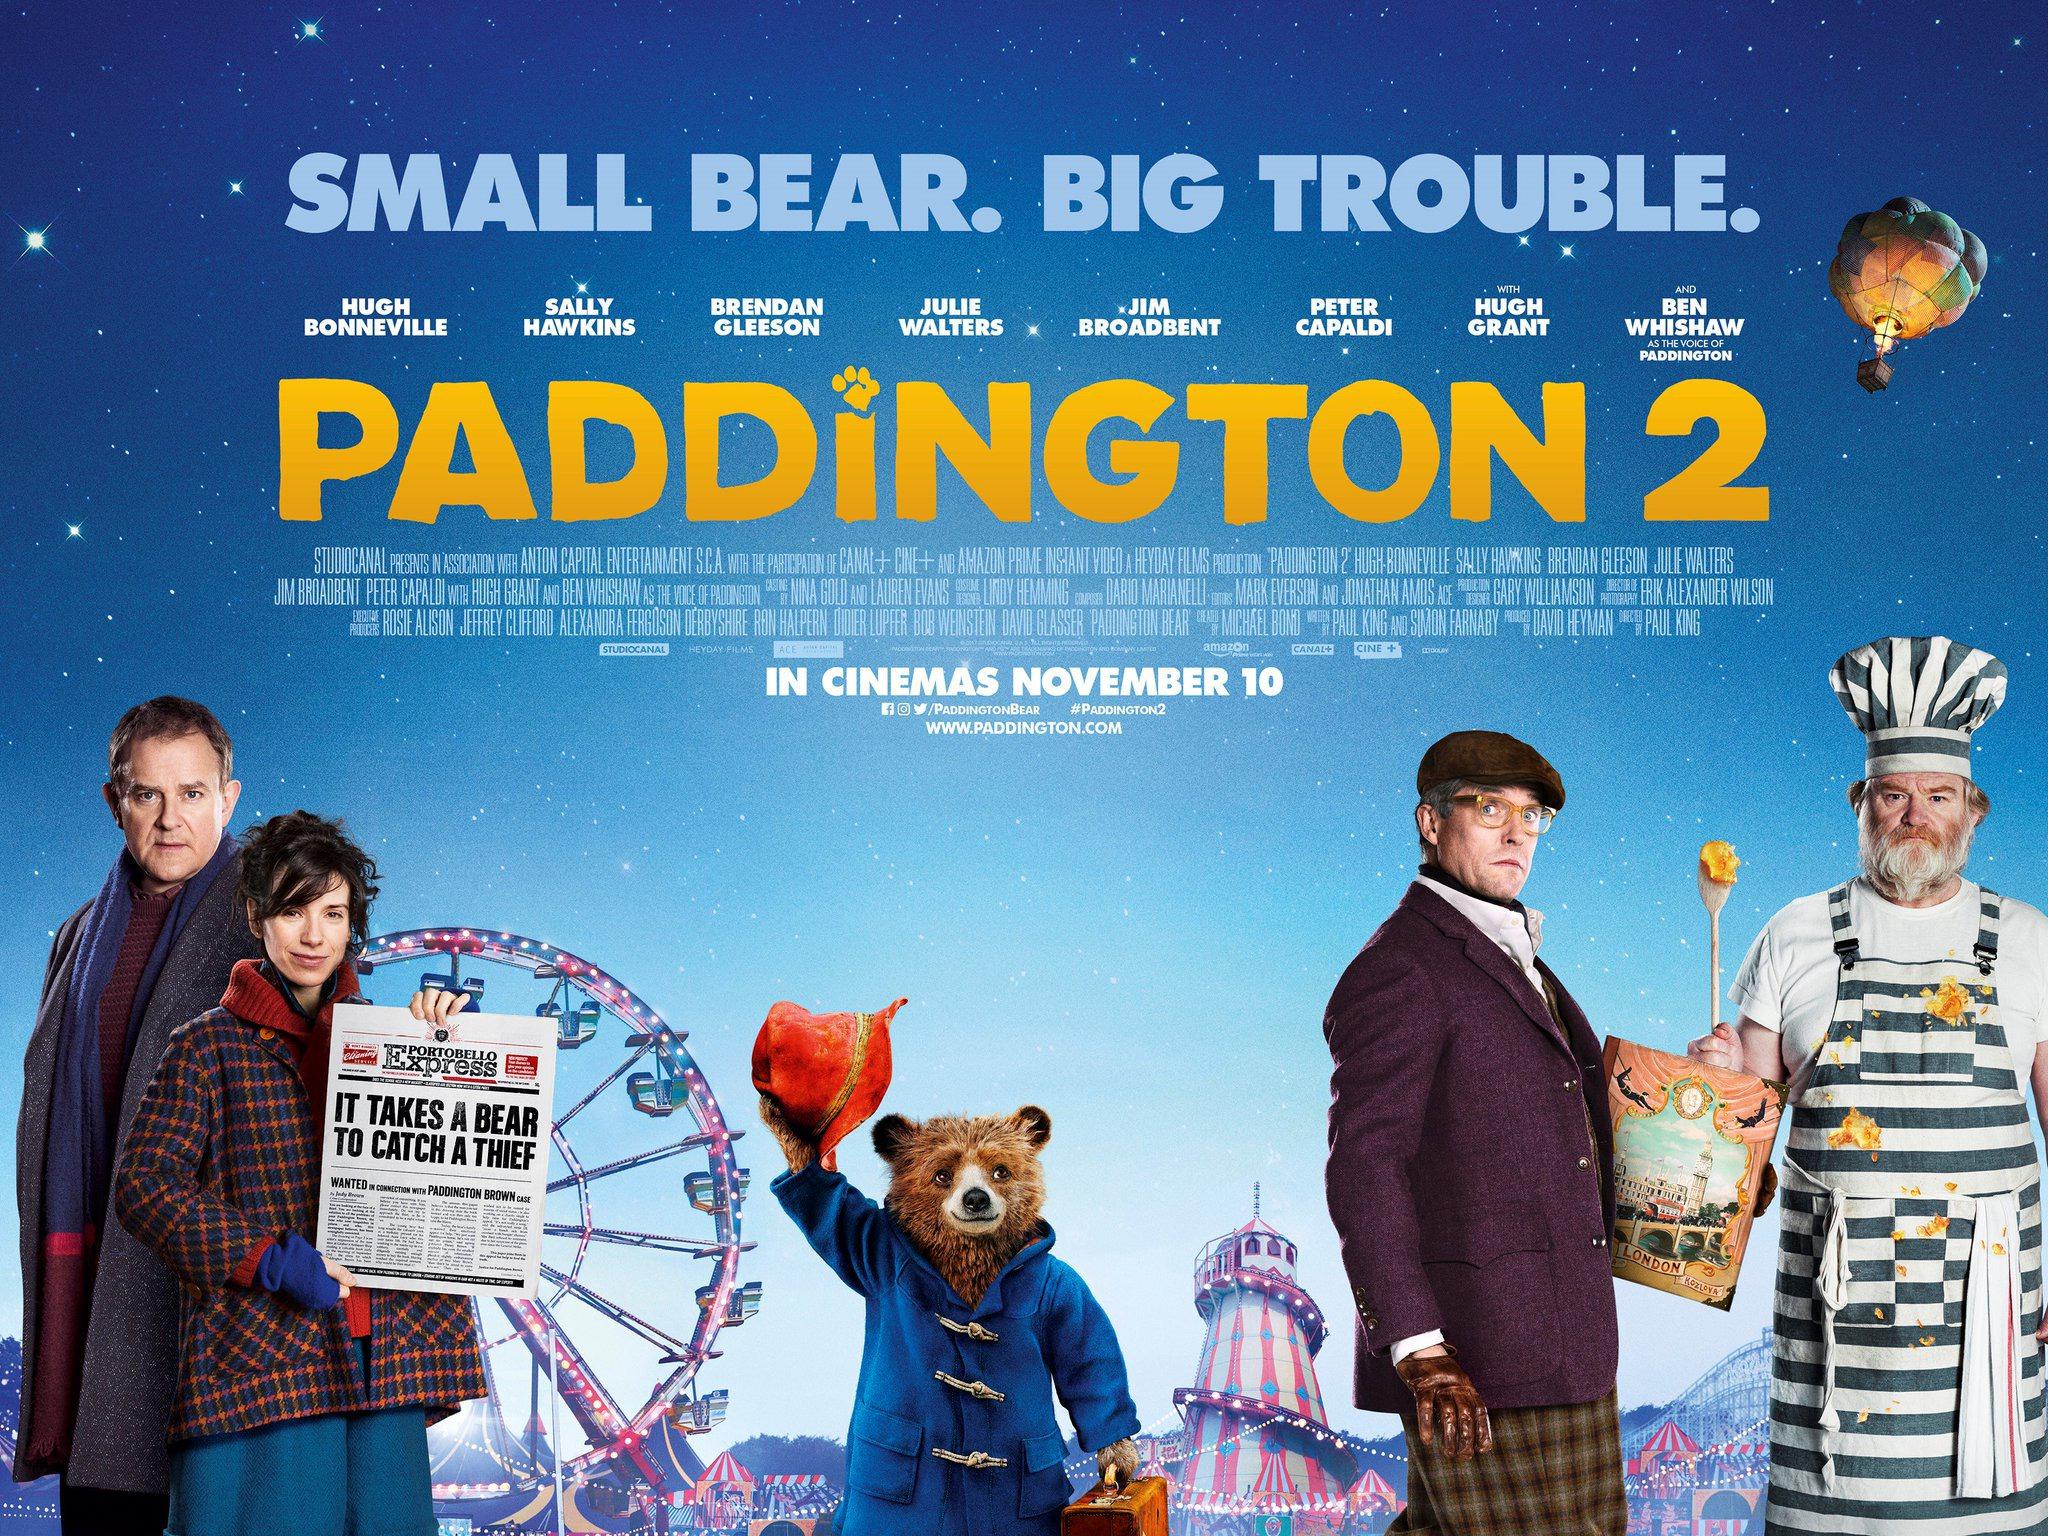 Paddington 2 Official Movie Poster